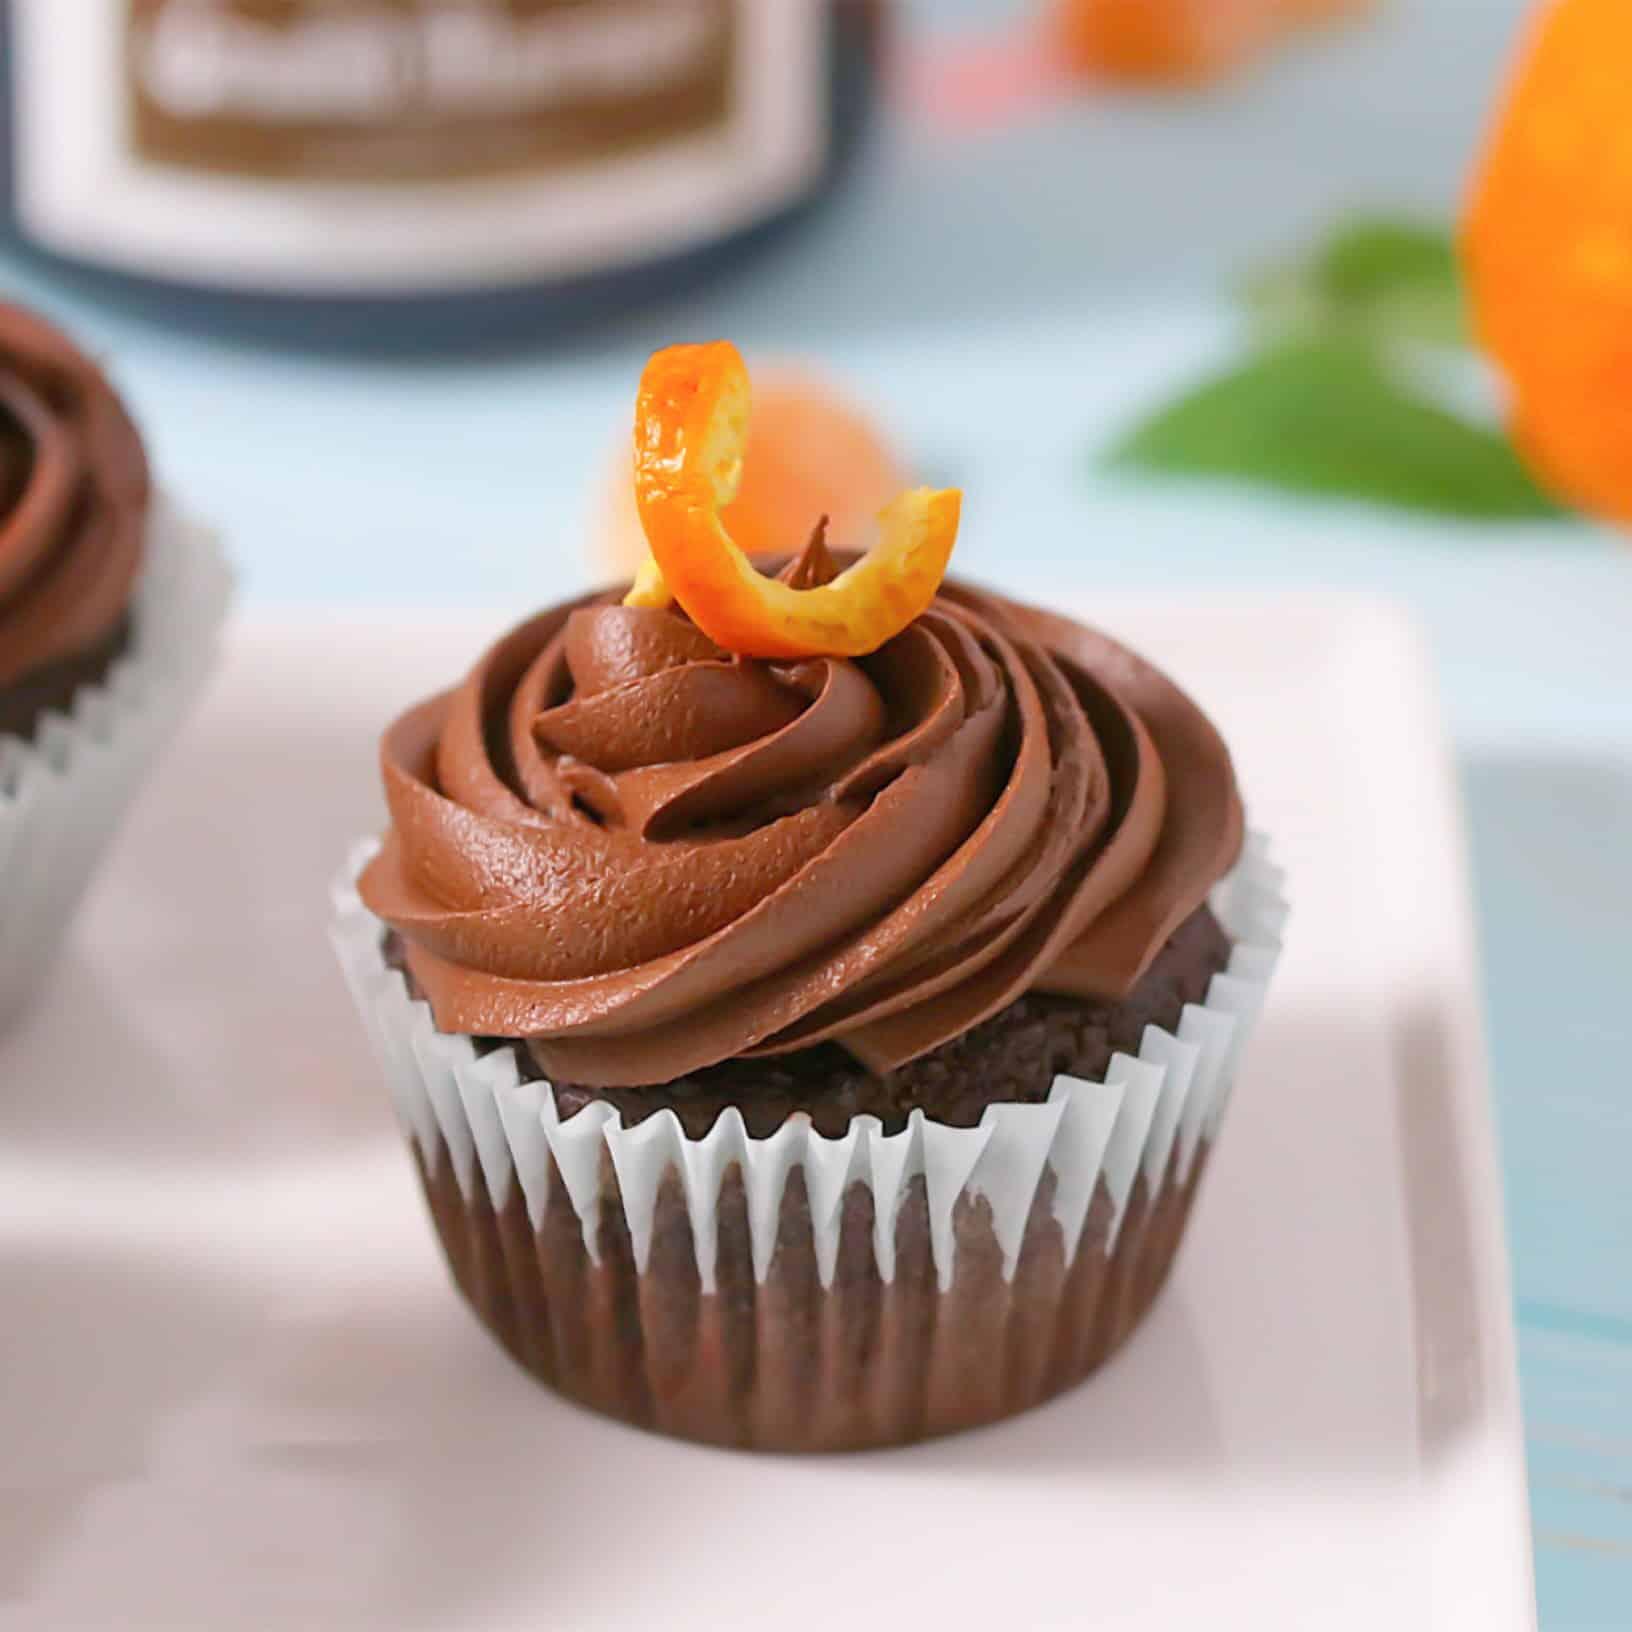 Chocolate Grand Marnier Cupcakes